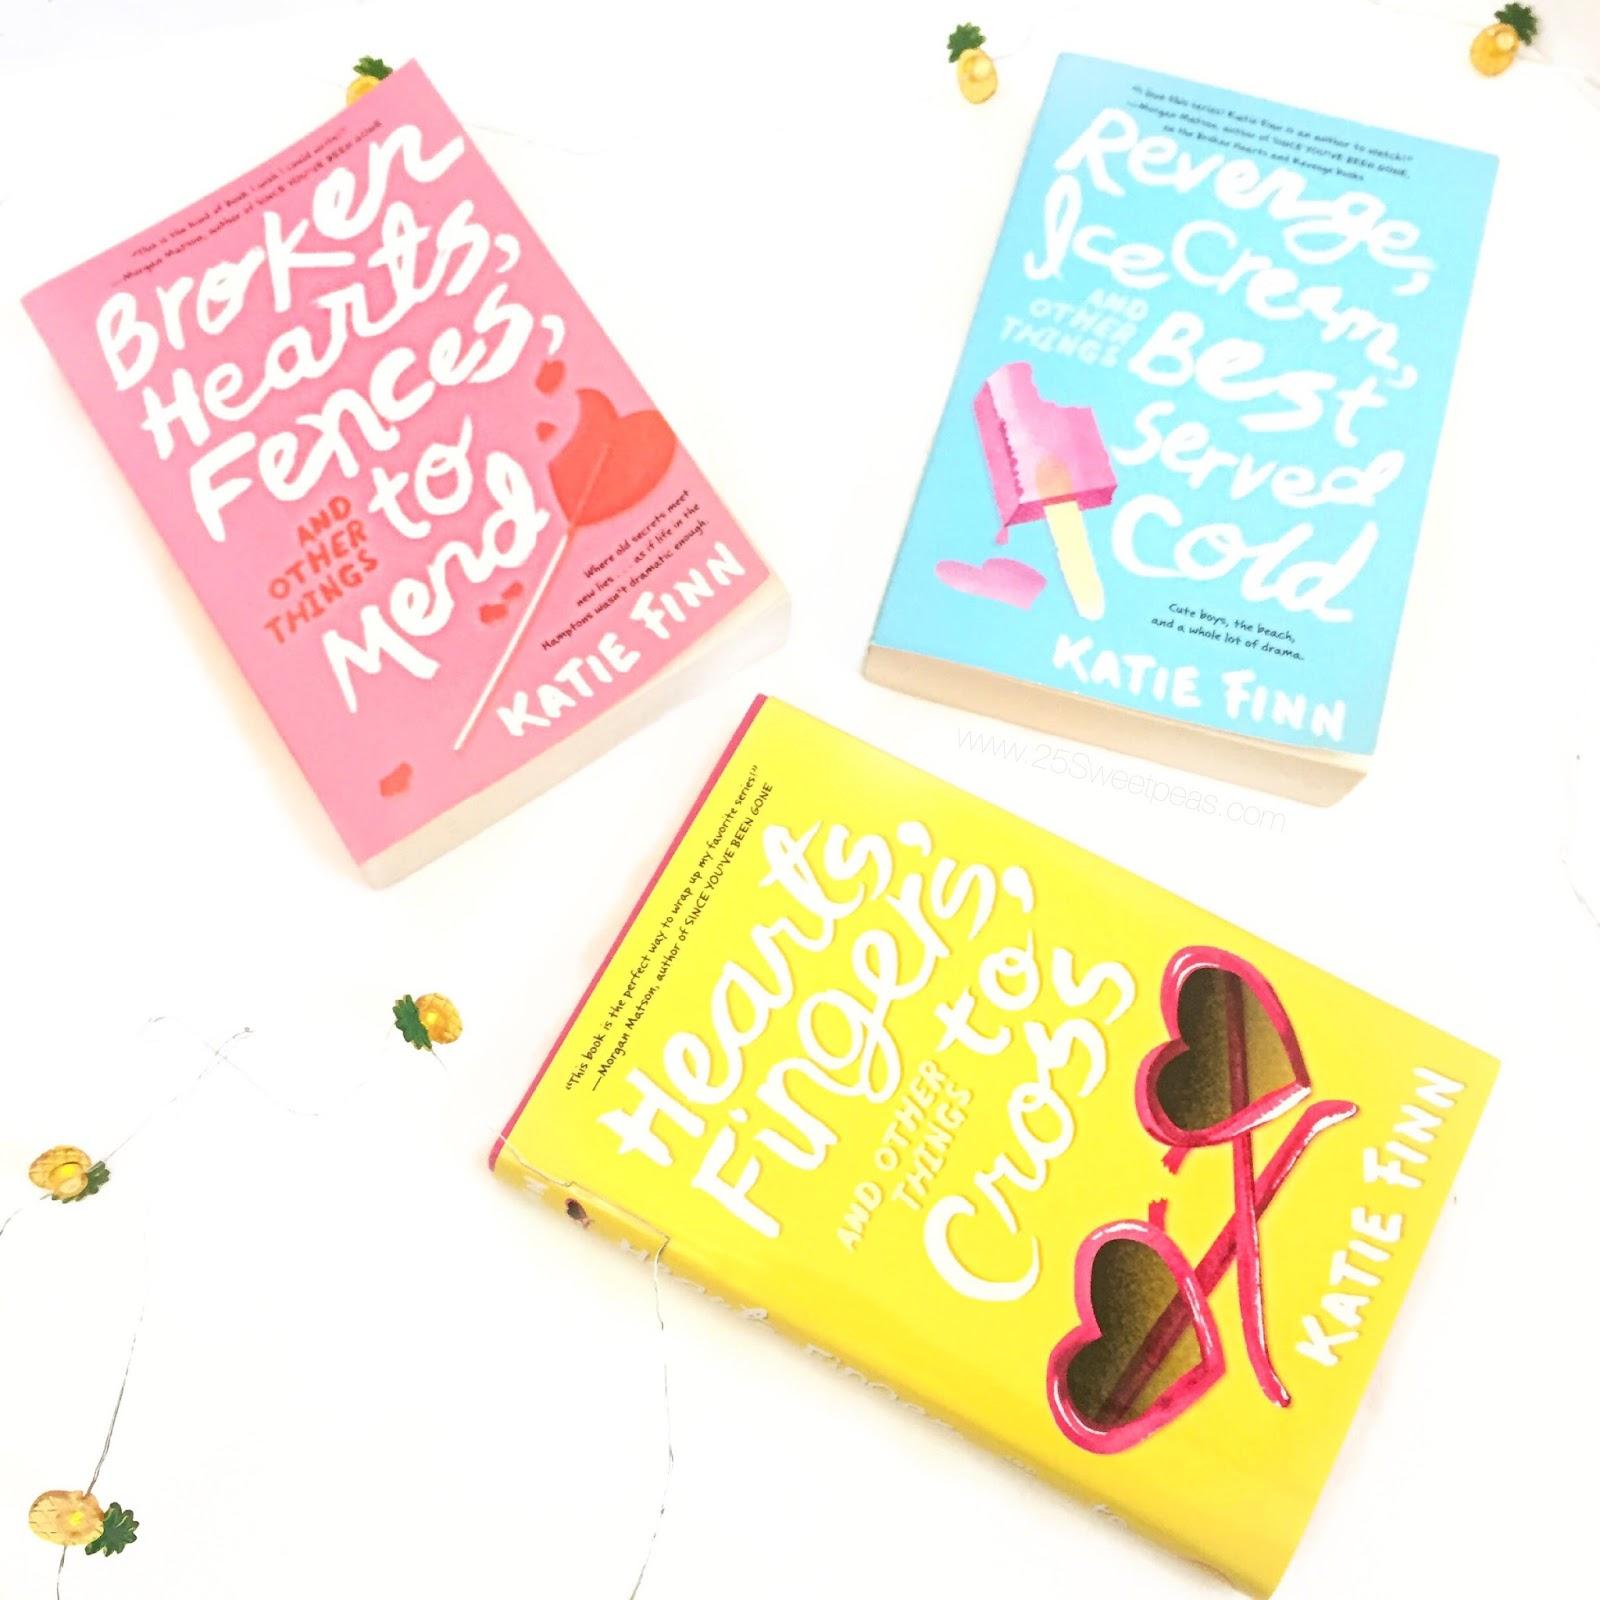 Katie Finn Books